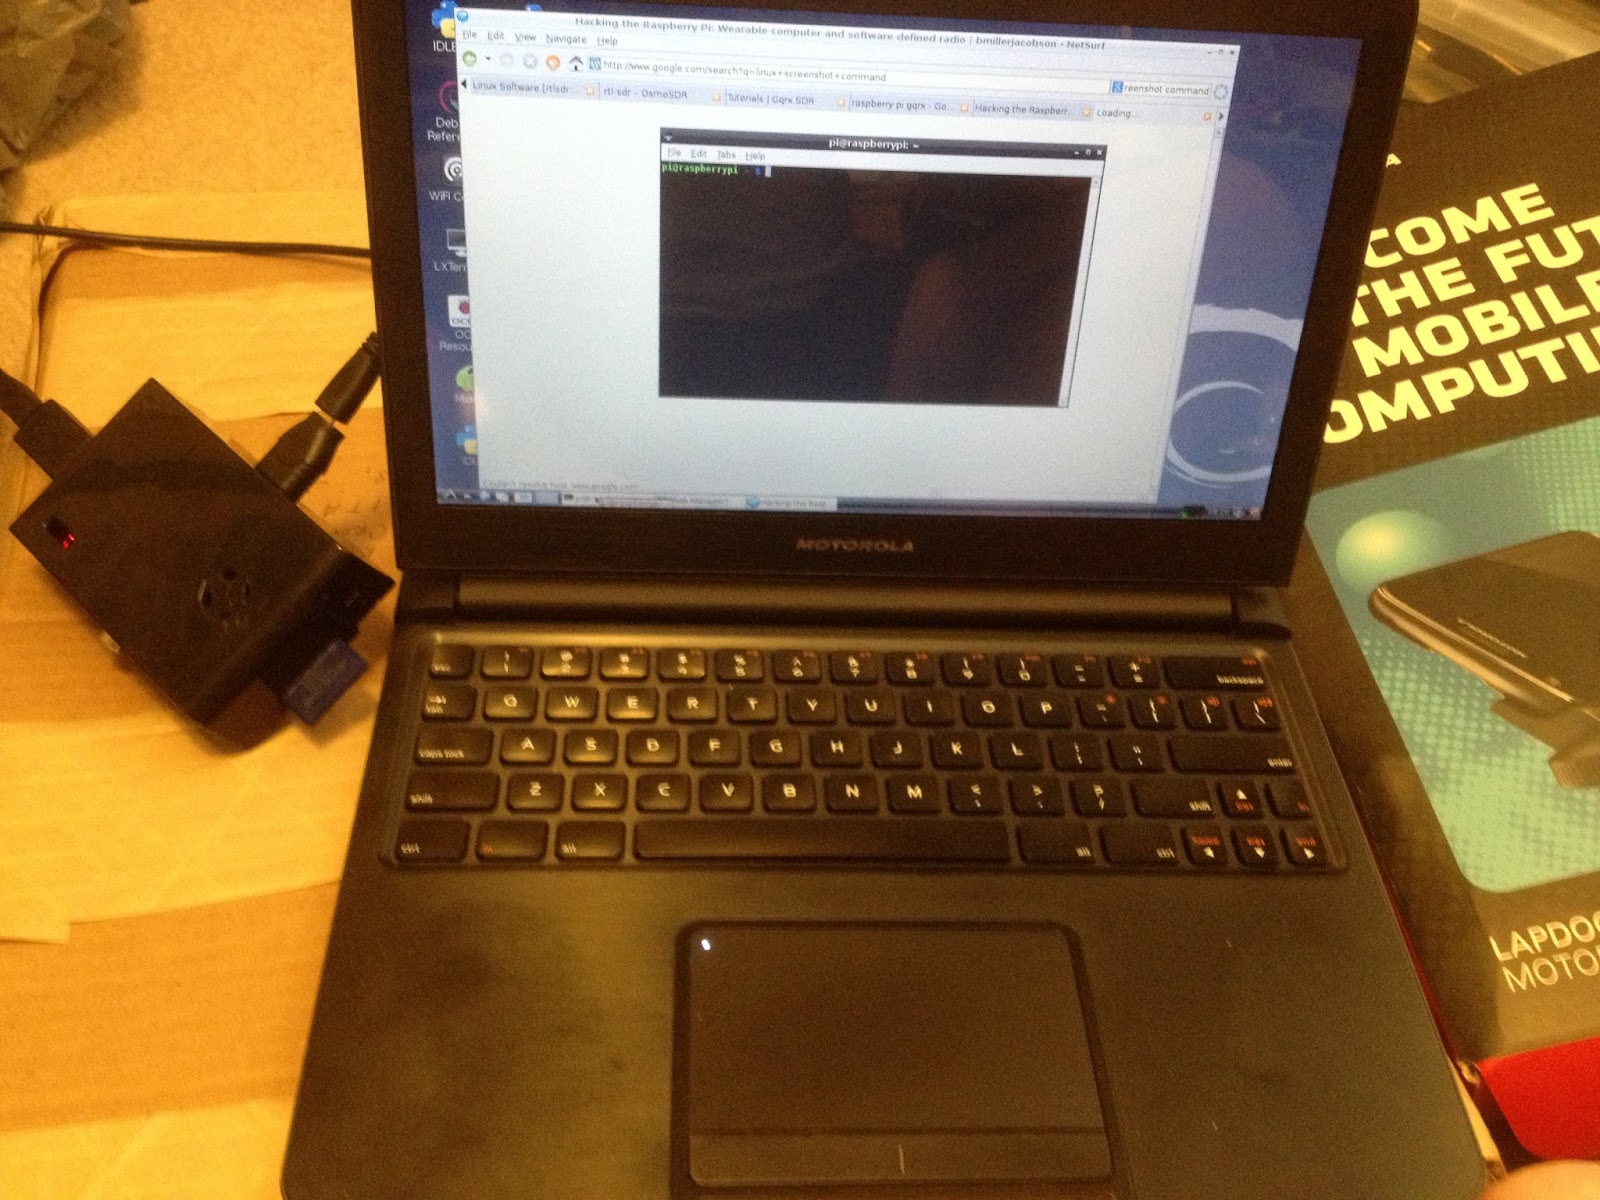 Electronic Diversions: Raspberry Pi and Motorola Atrix Lapdock and